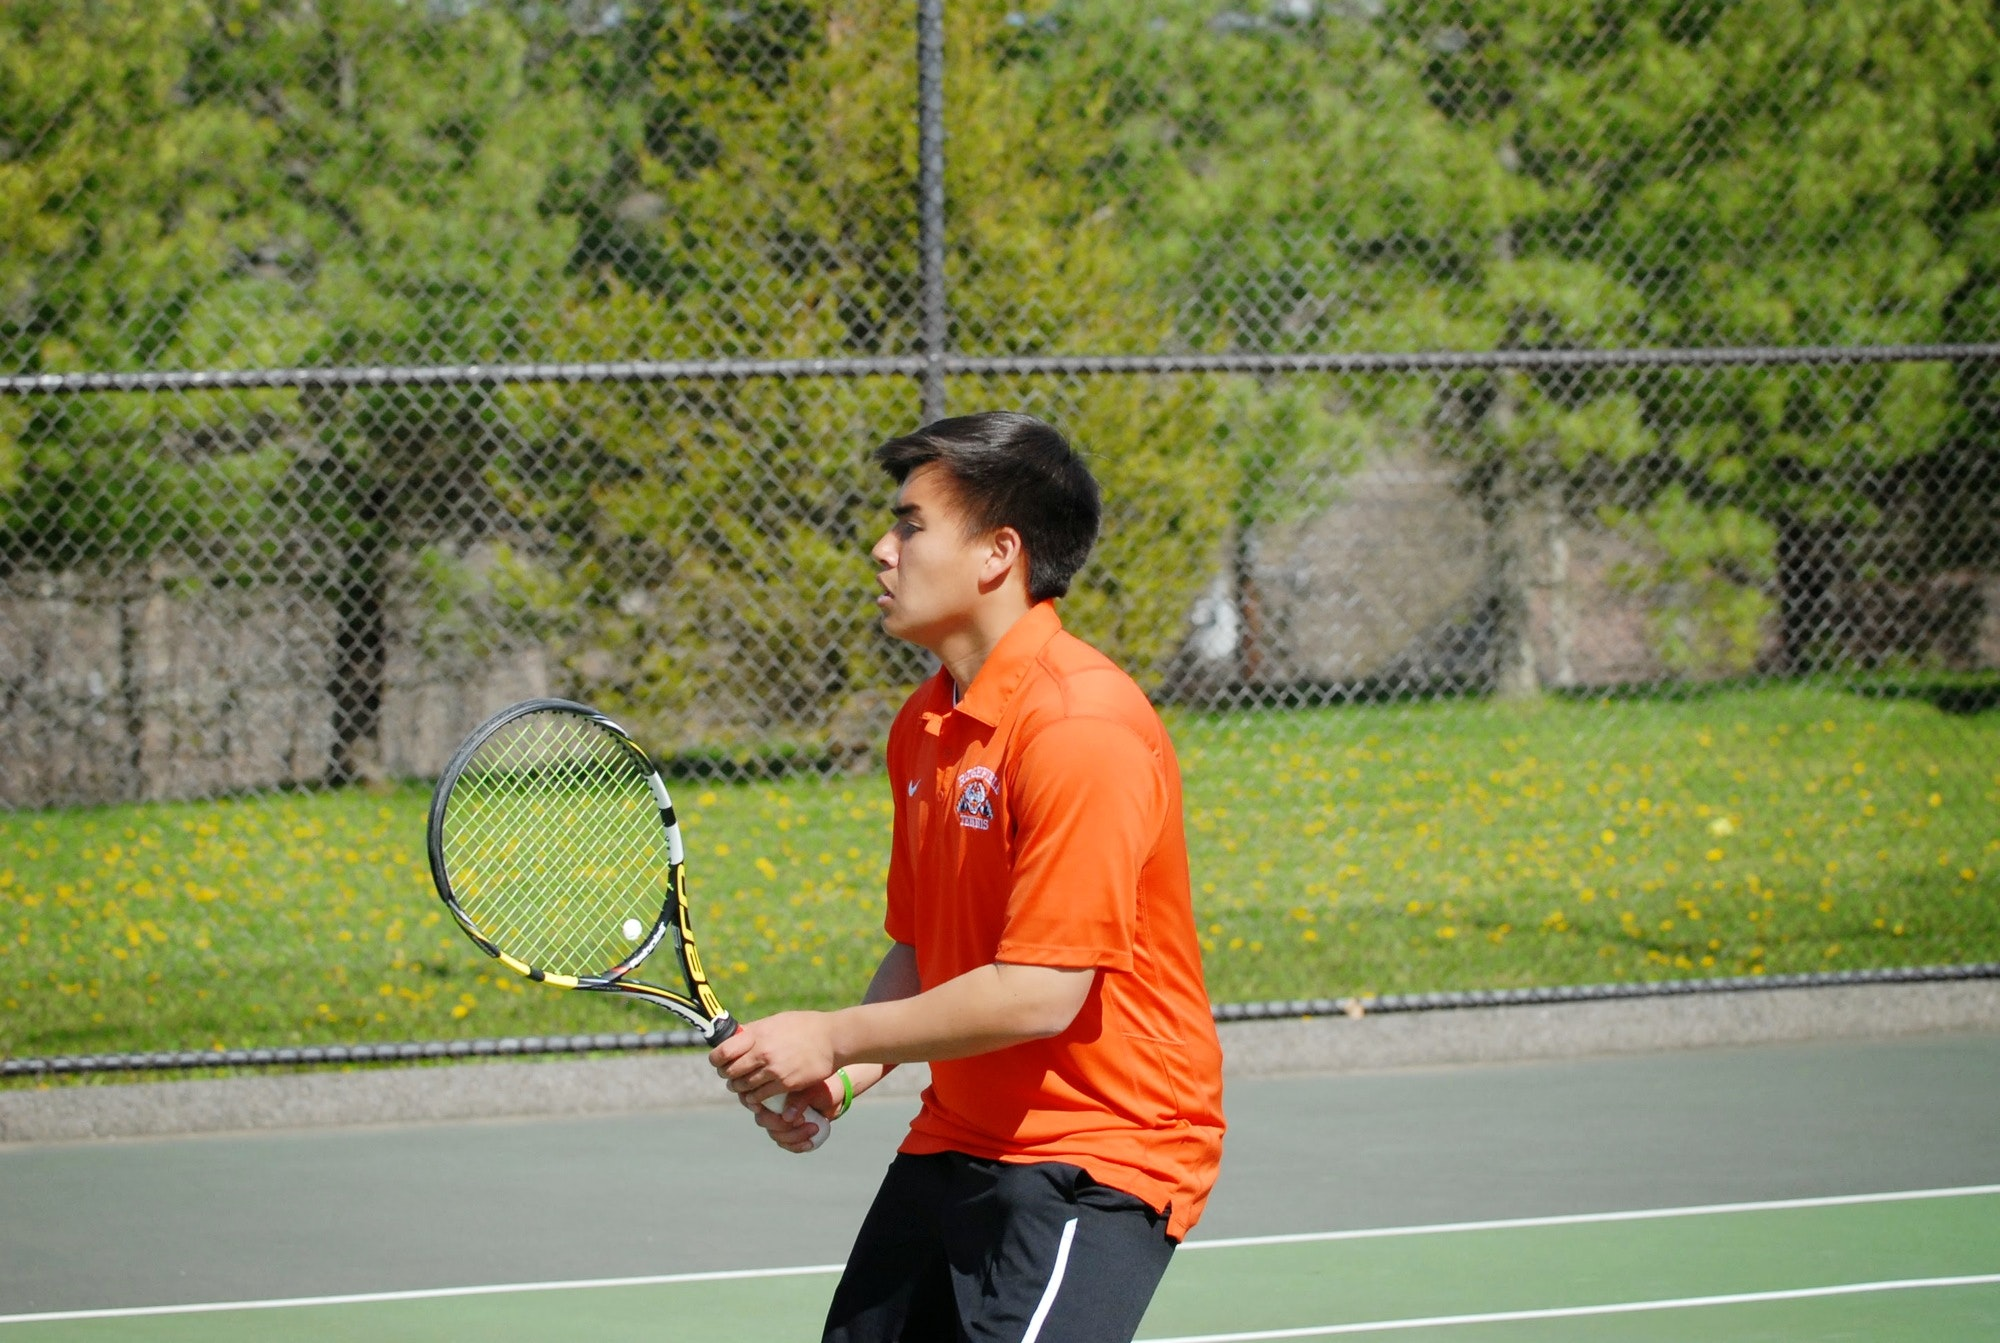 Aaron C. teaches tennis lessons in Ridgefield, CT